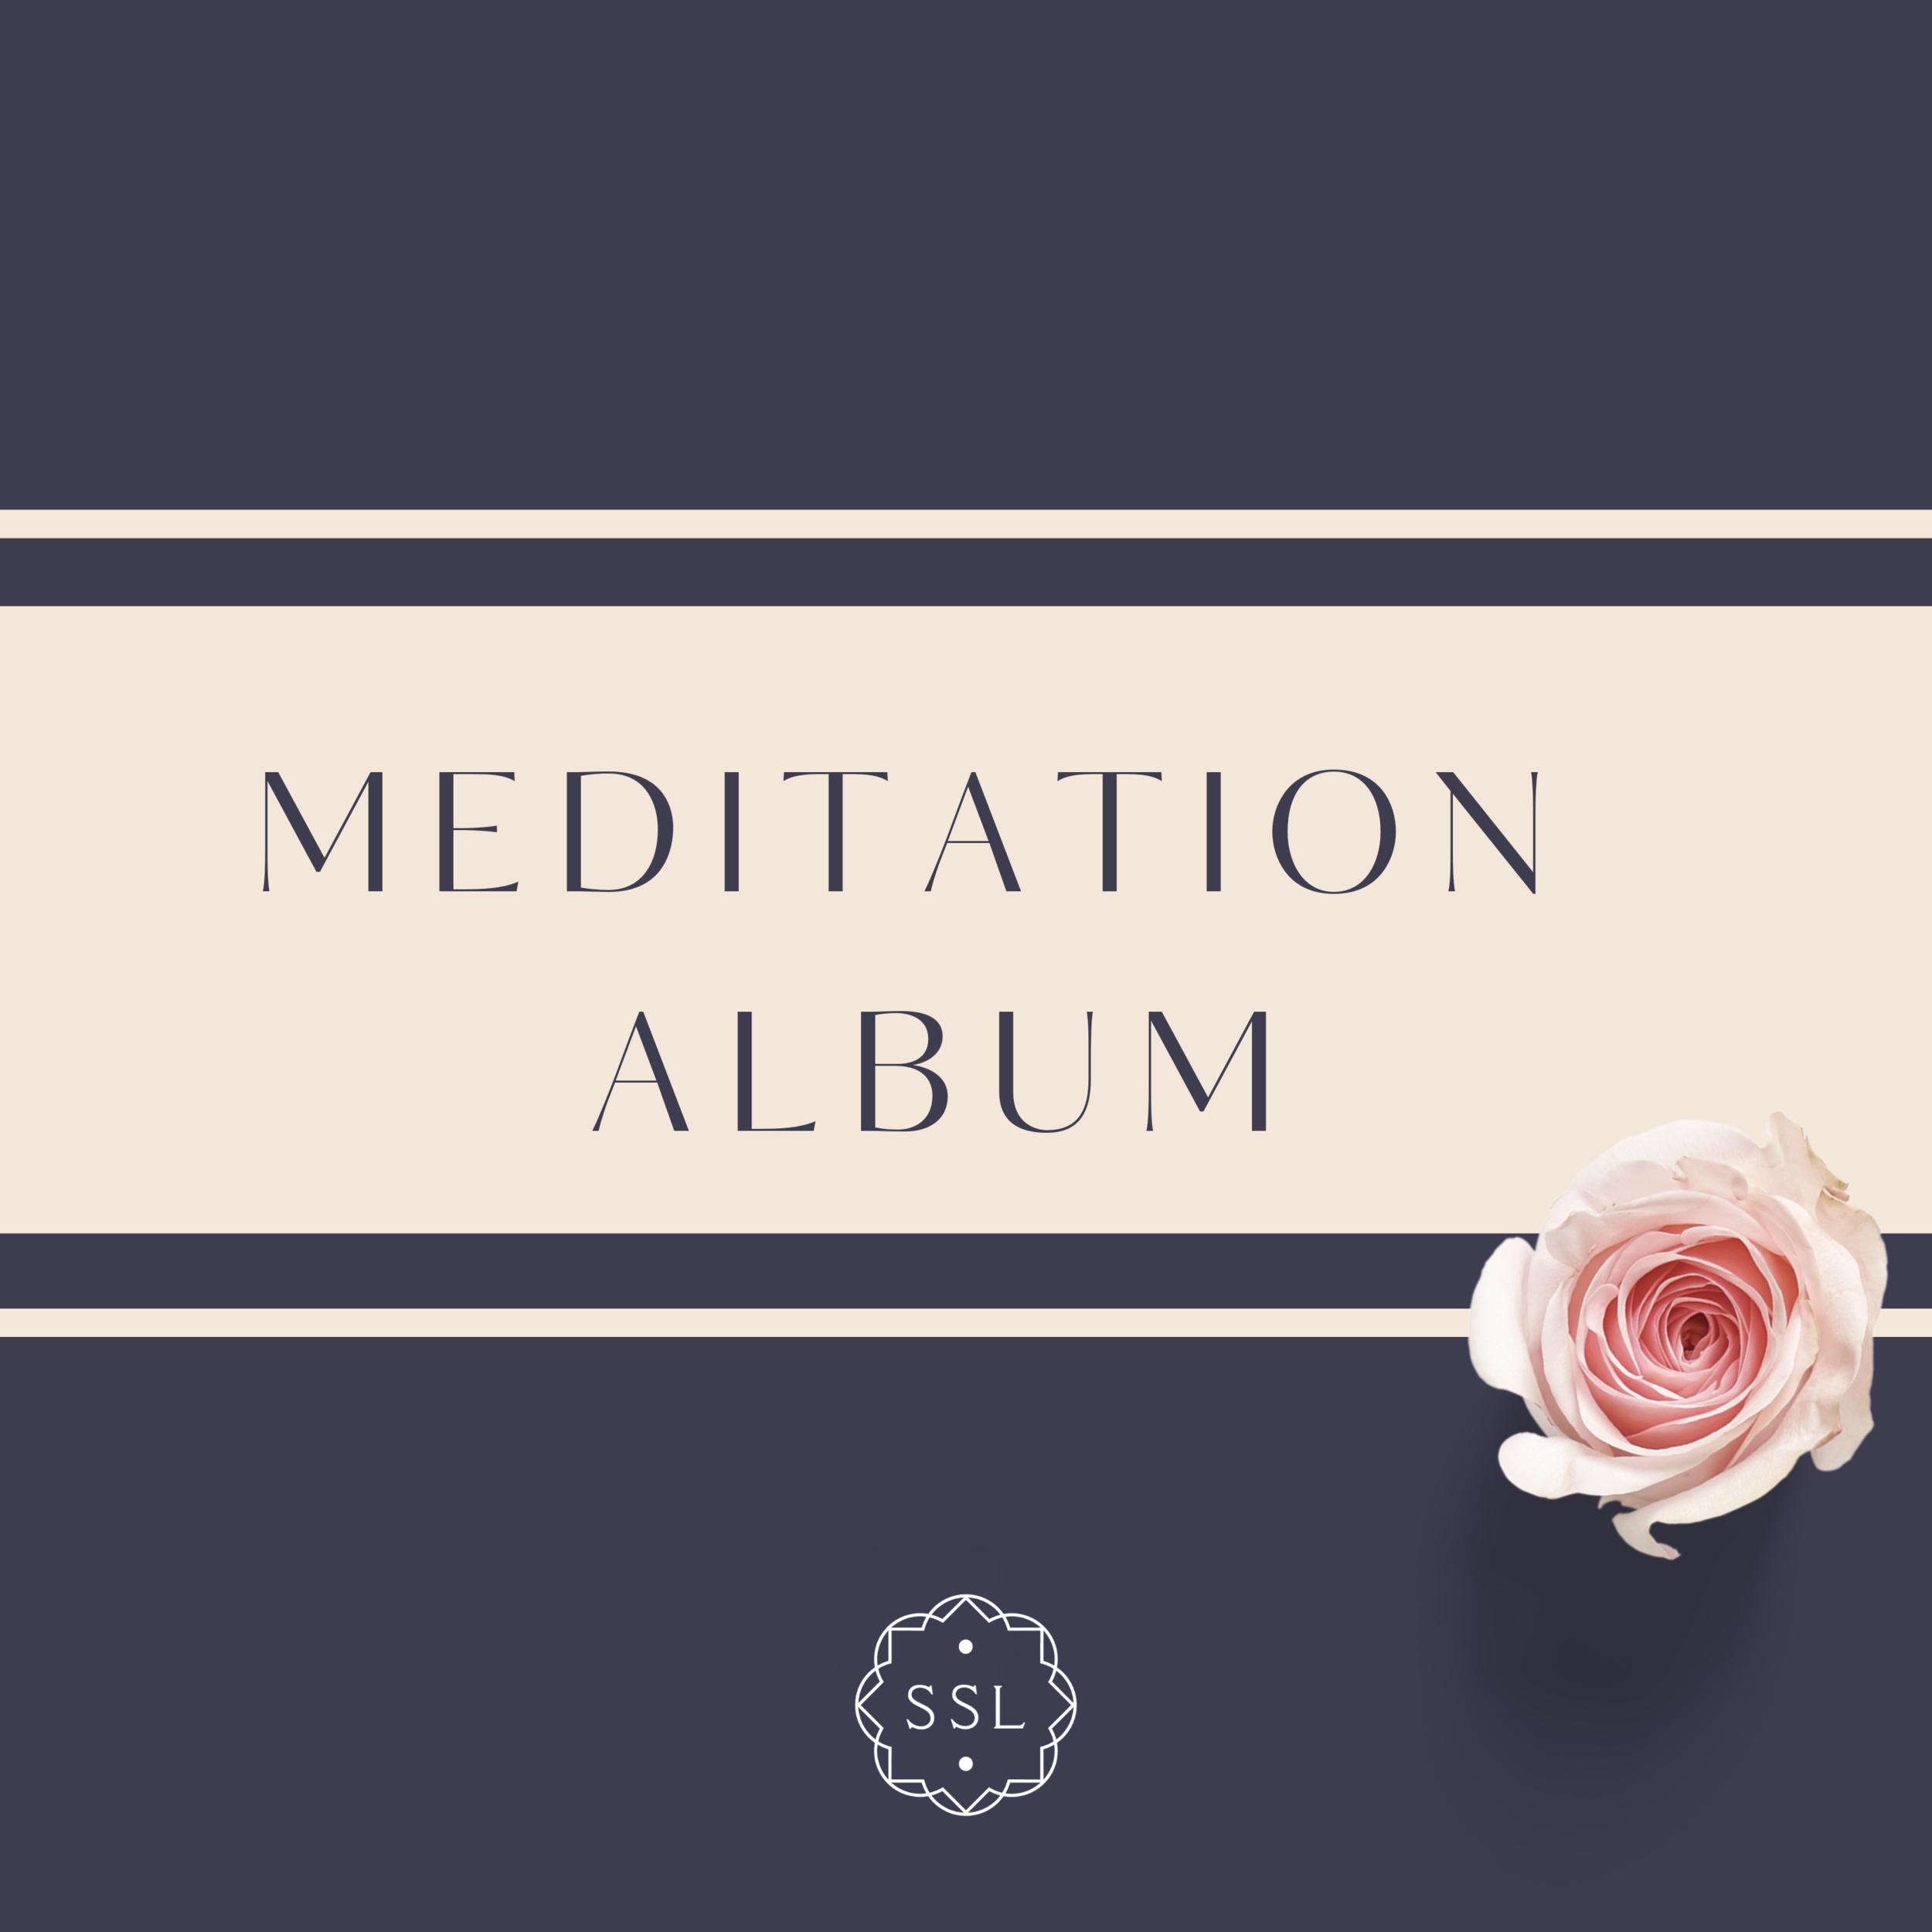 meditation album(2).png